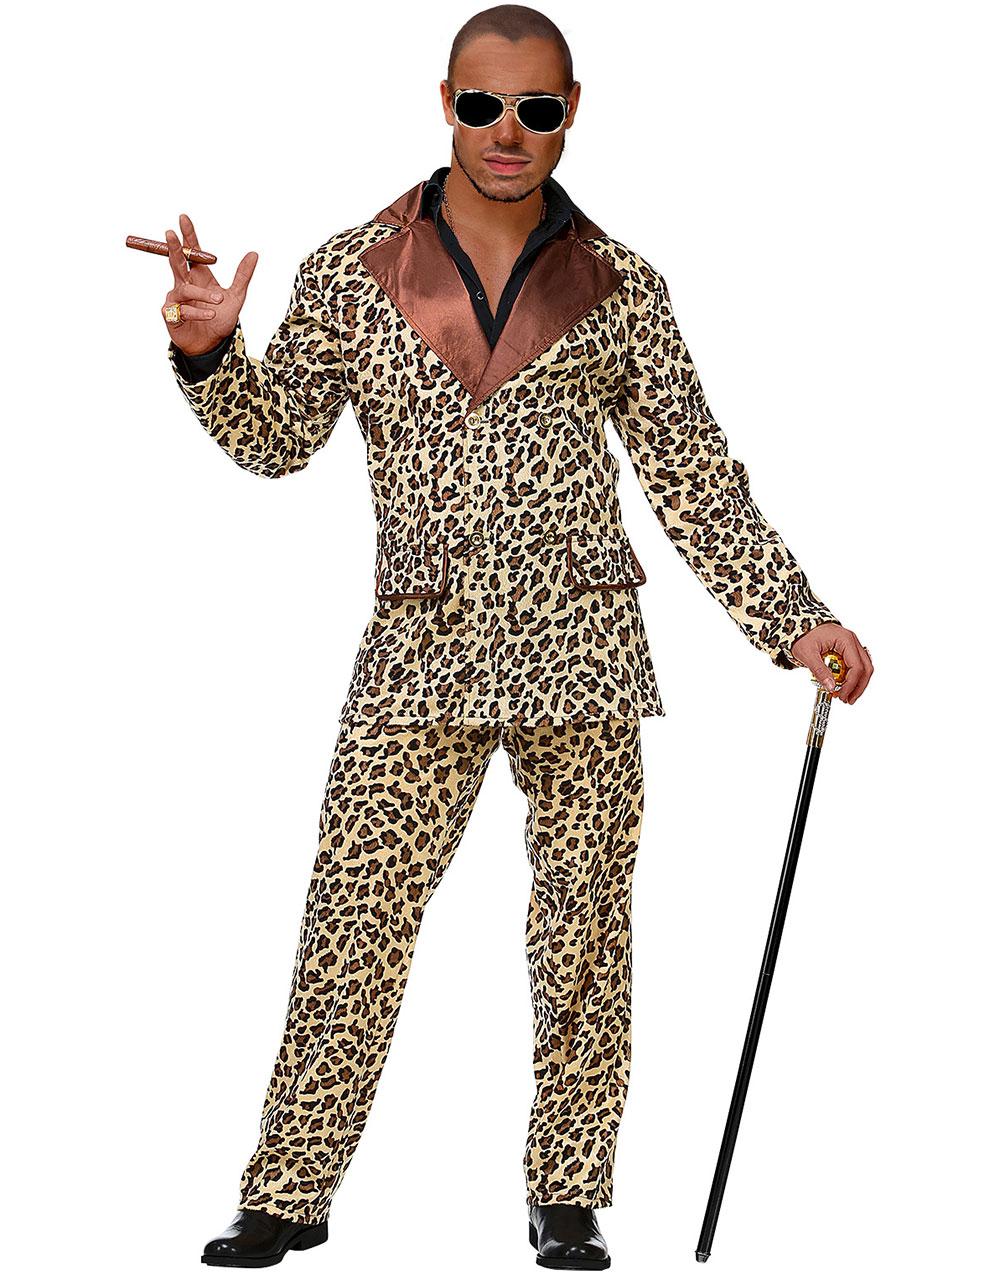 Dräkter Leopardmönstrad Pimpdräkter Maskeraddräkt Herr Pimp wC8pq7